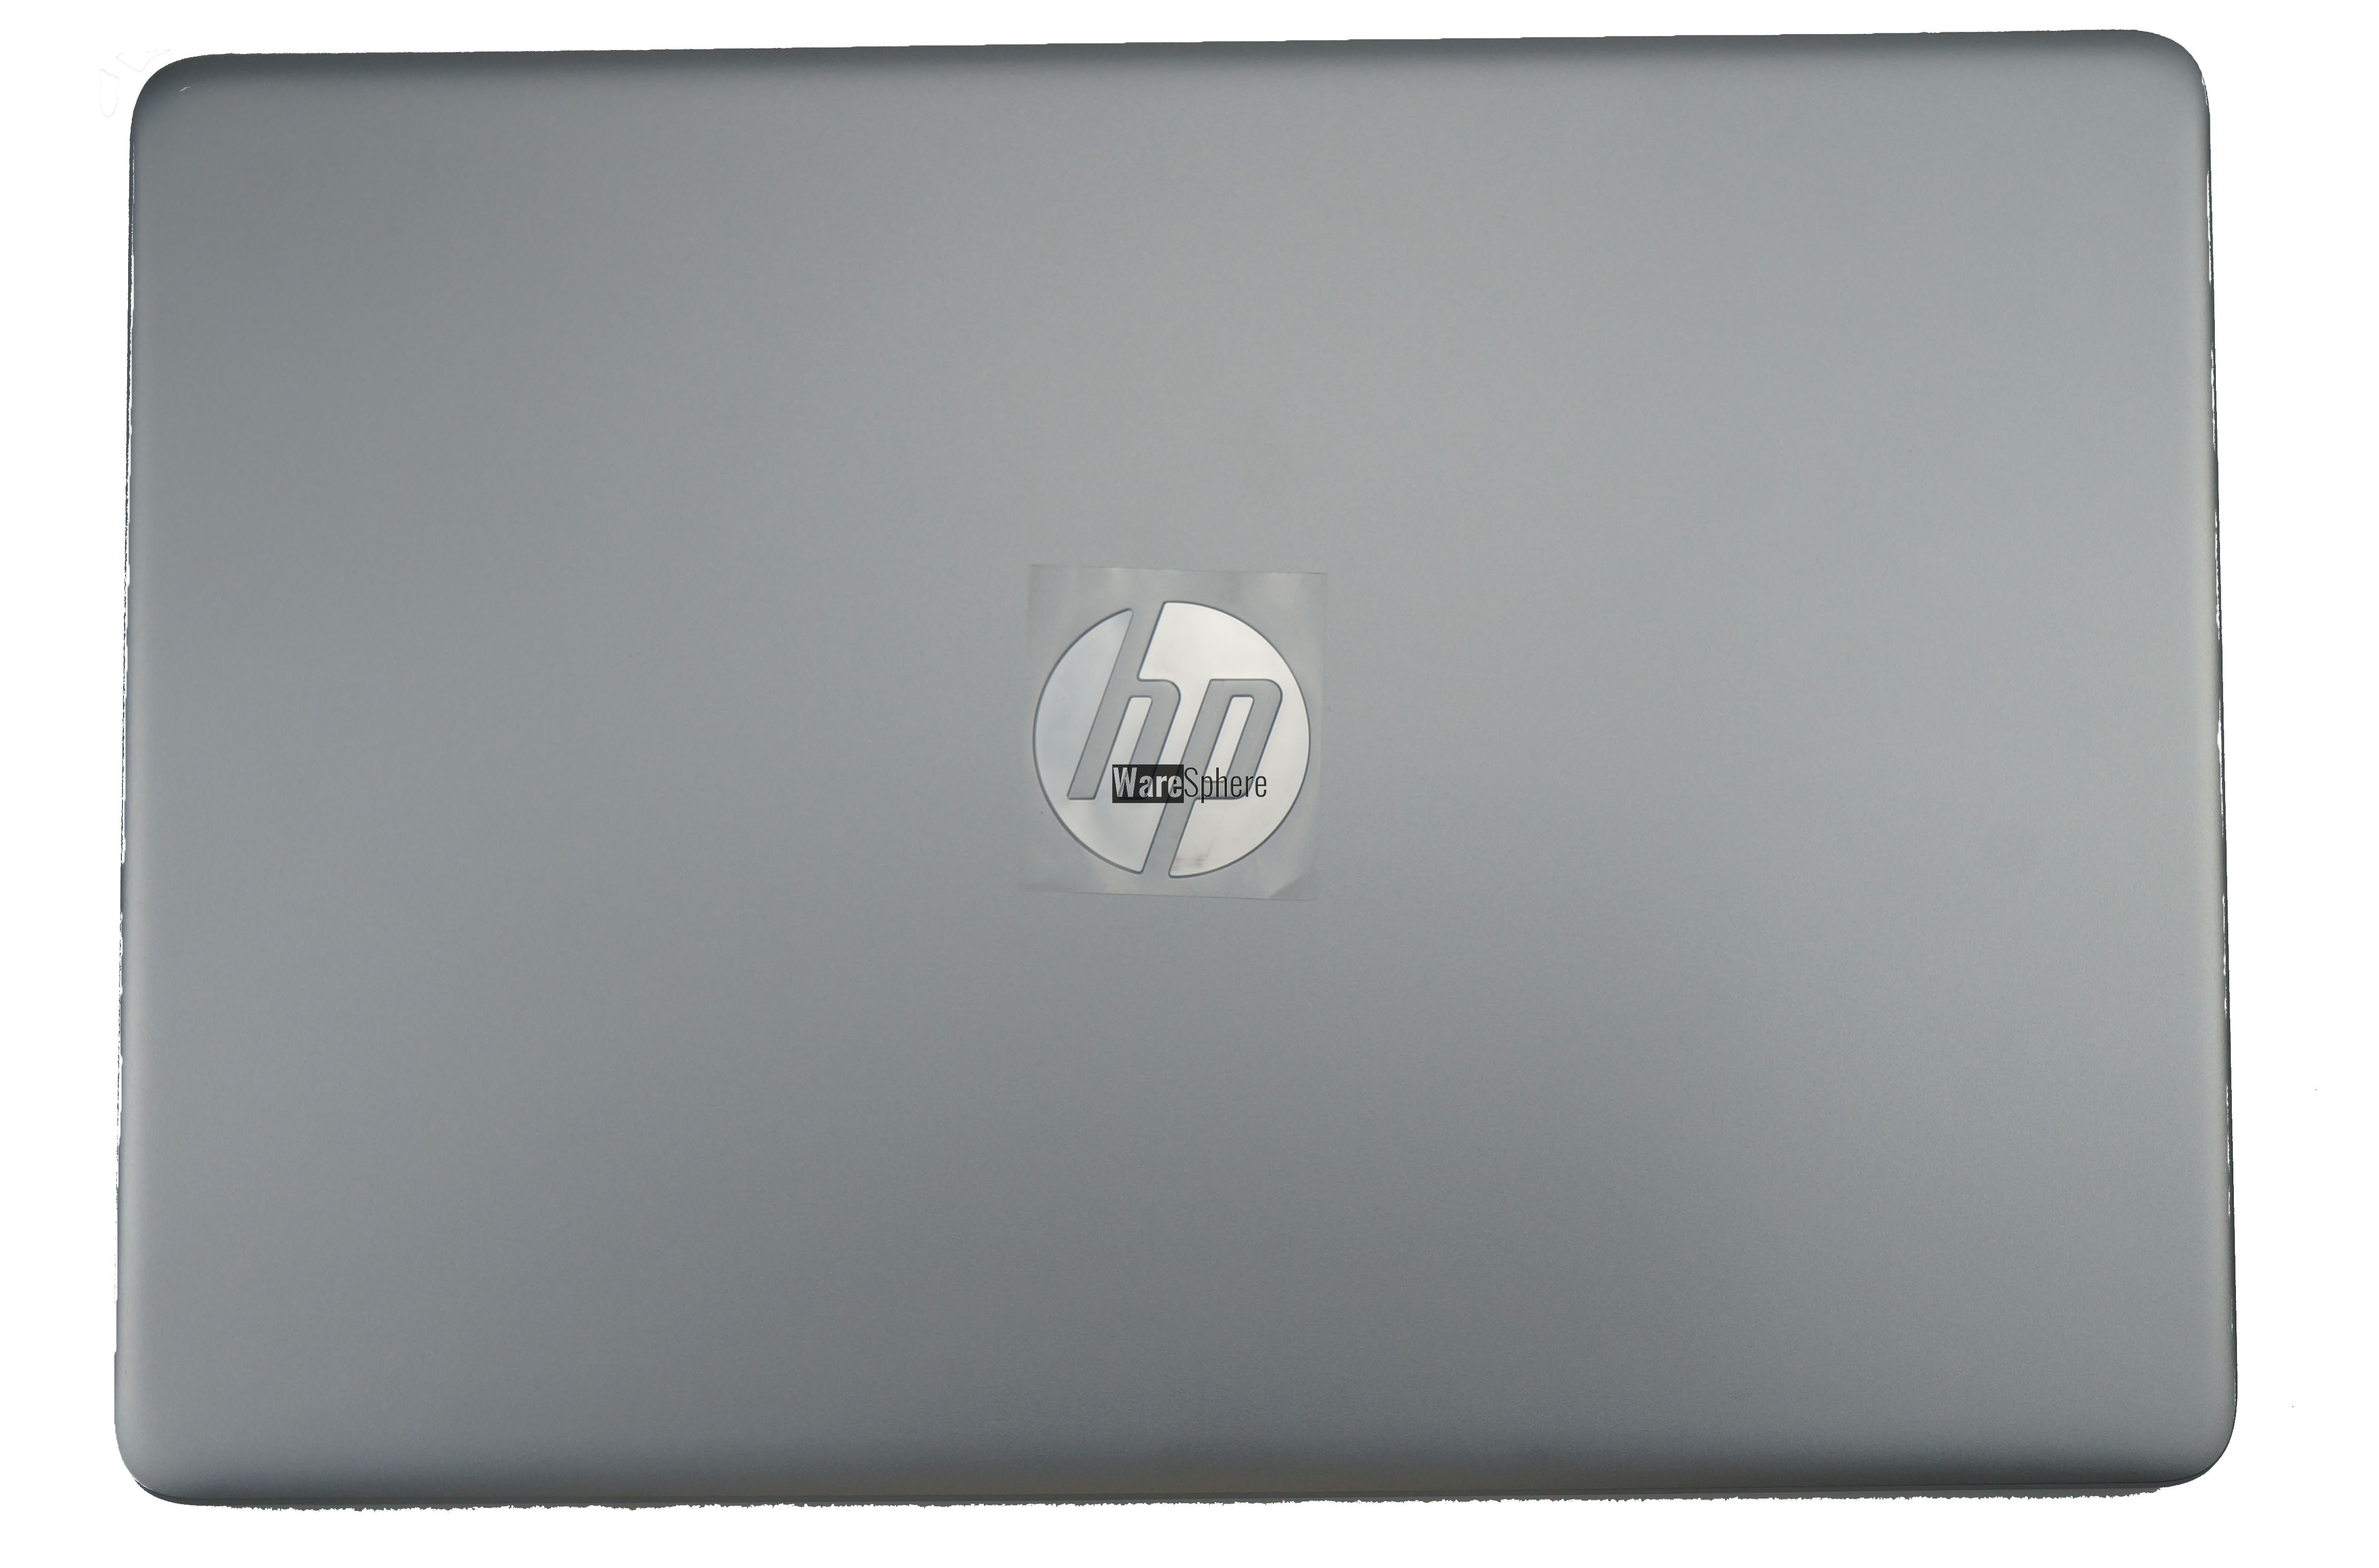 LCD Back Cover for HP 340G5 348G5 K12 348G5 L56978-001 Sliver